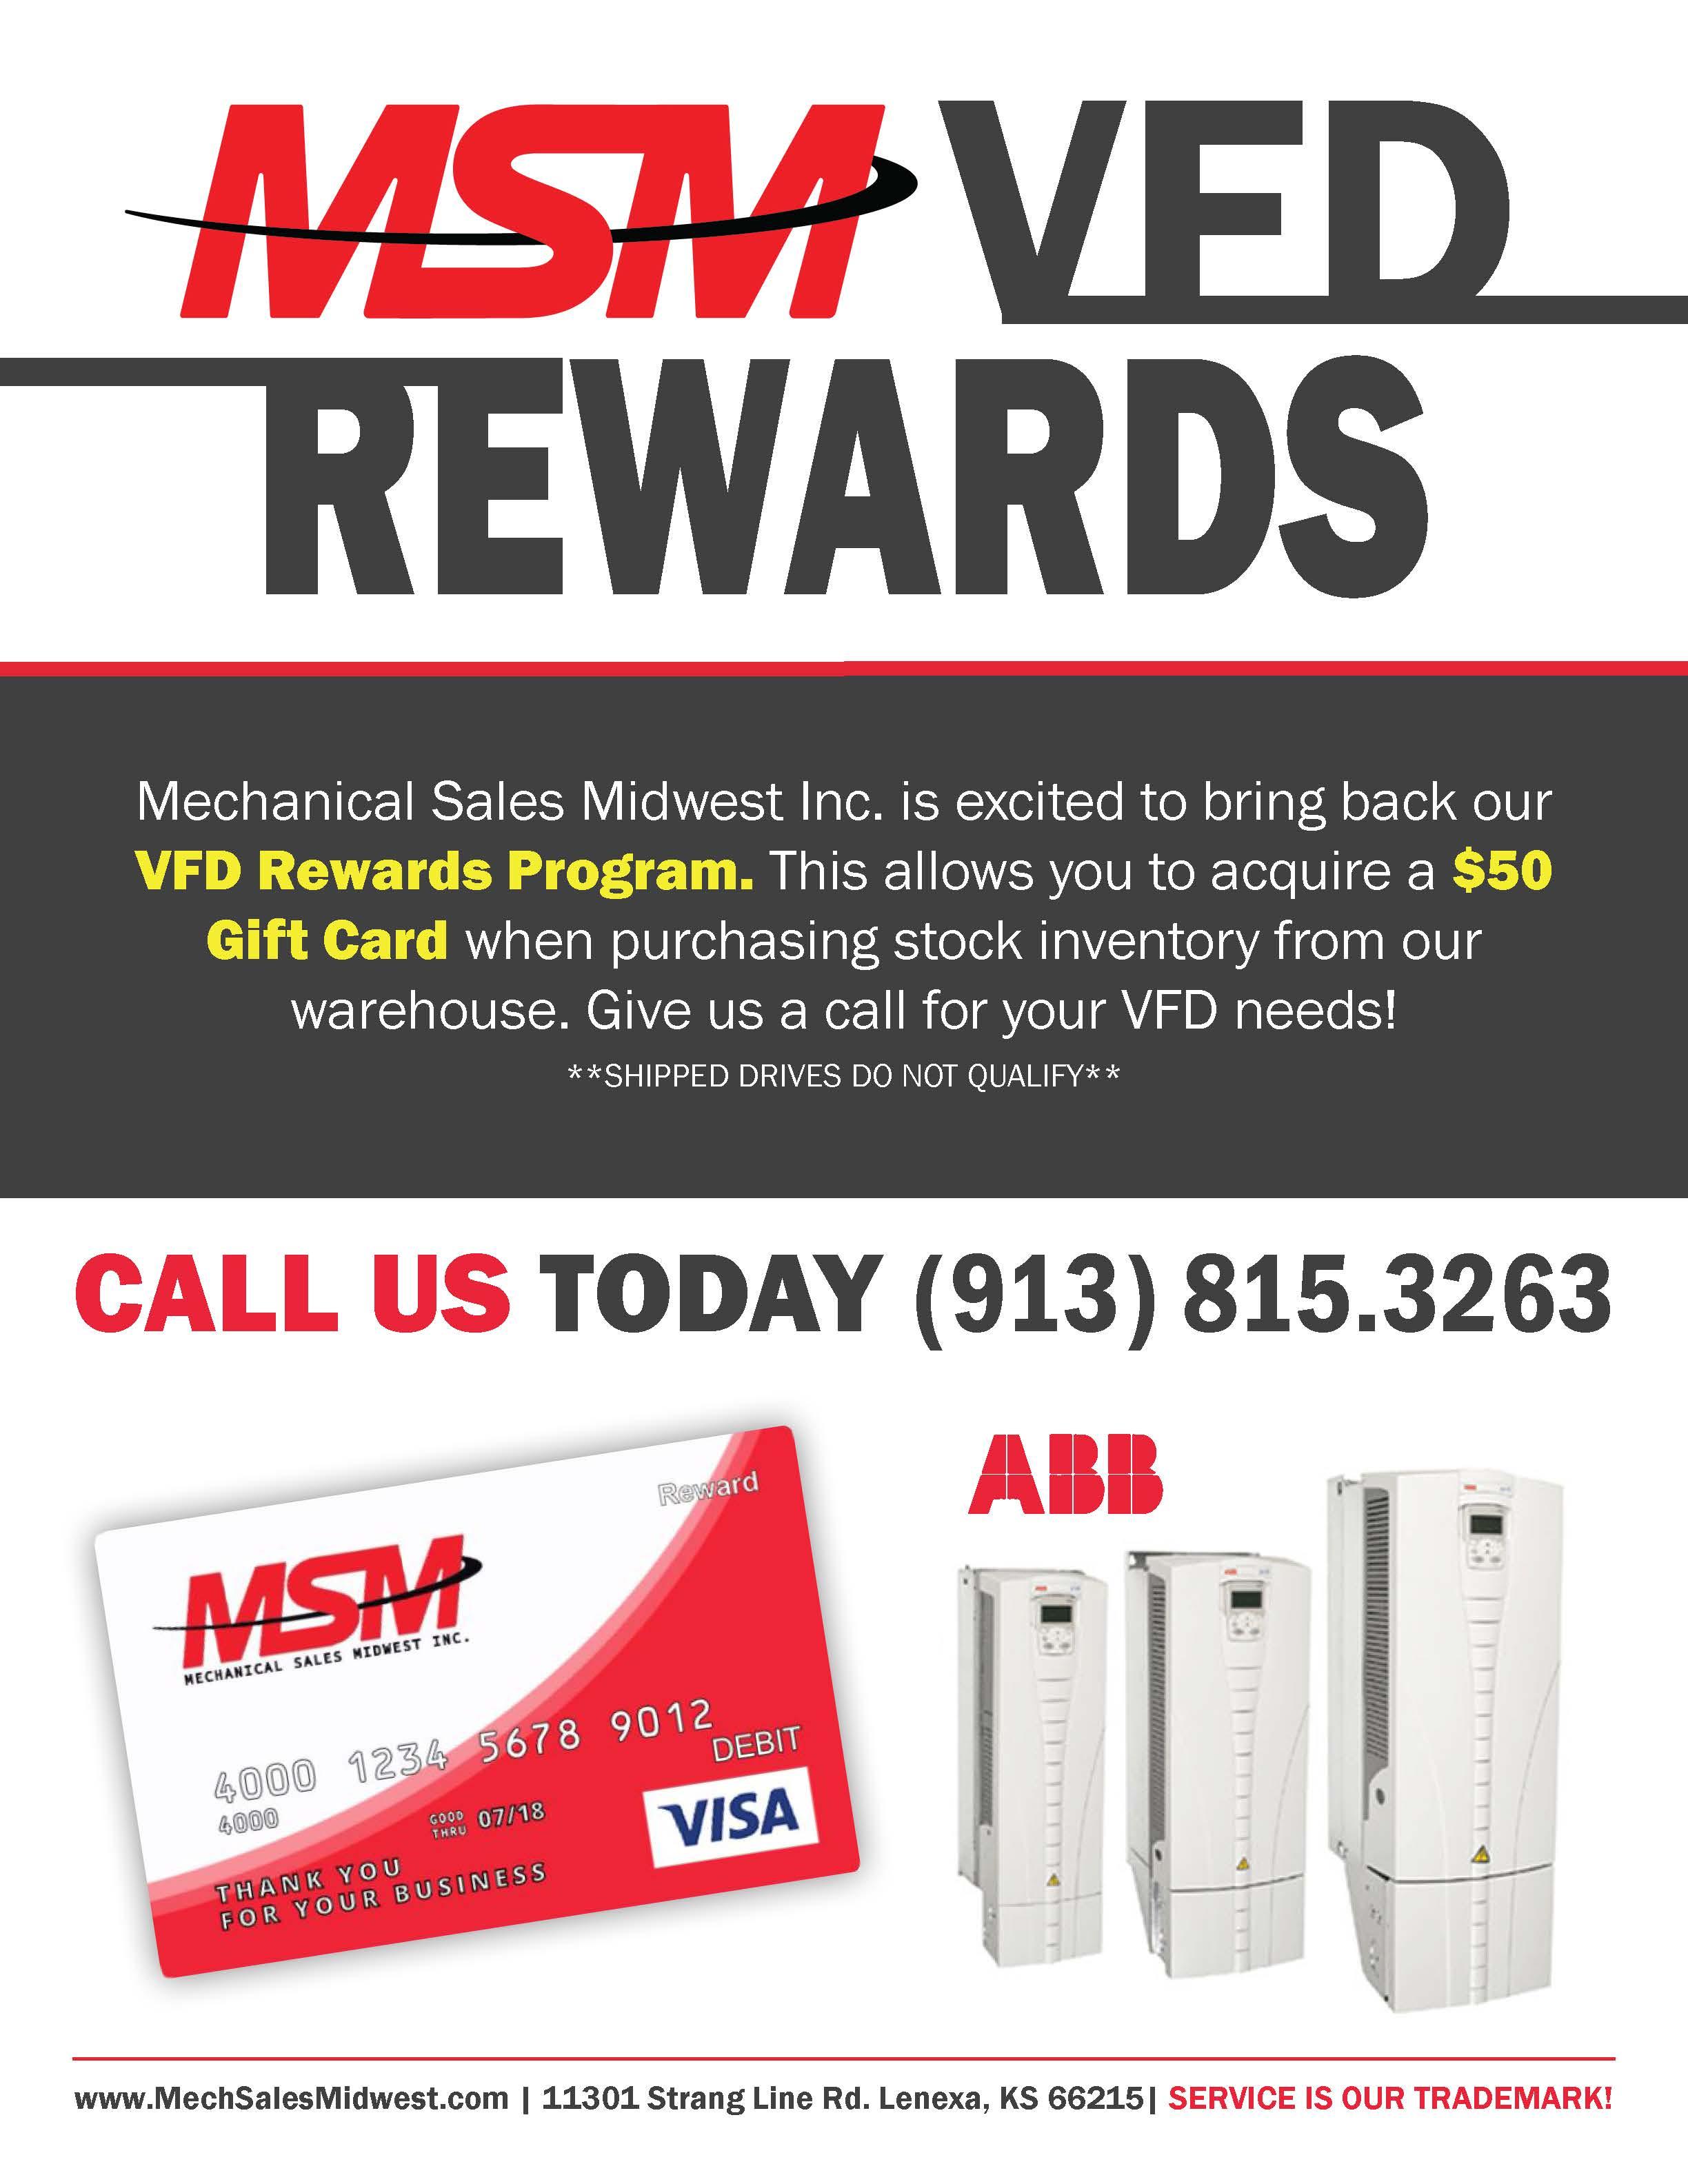 Need a VFD FAST?   Take Advantage of our VFD Rewards Program